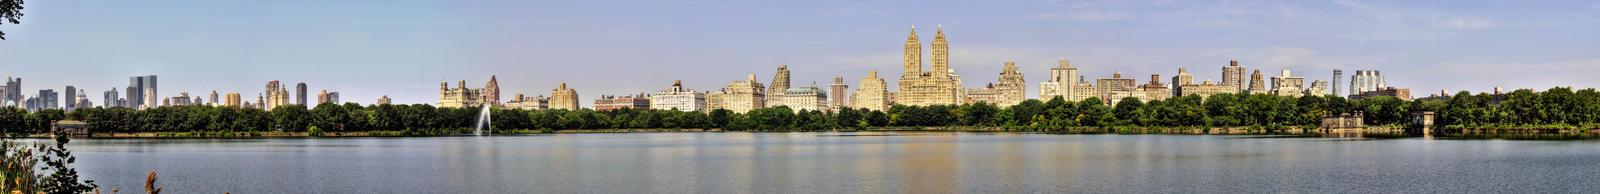 NYC-HDR